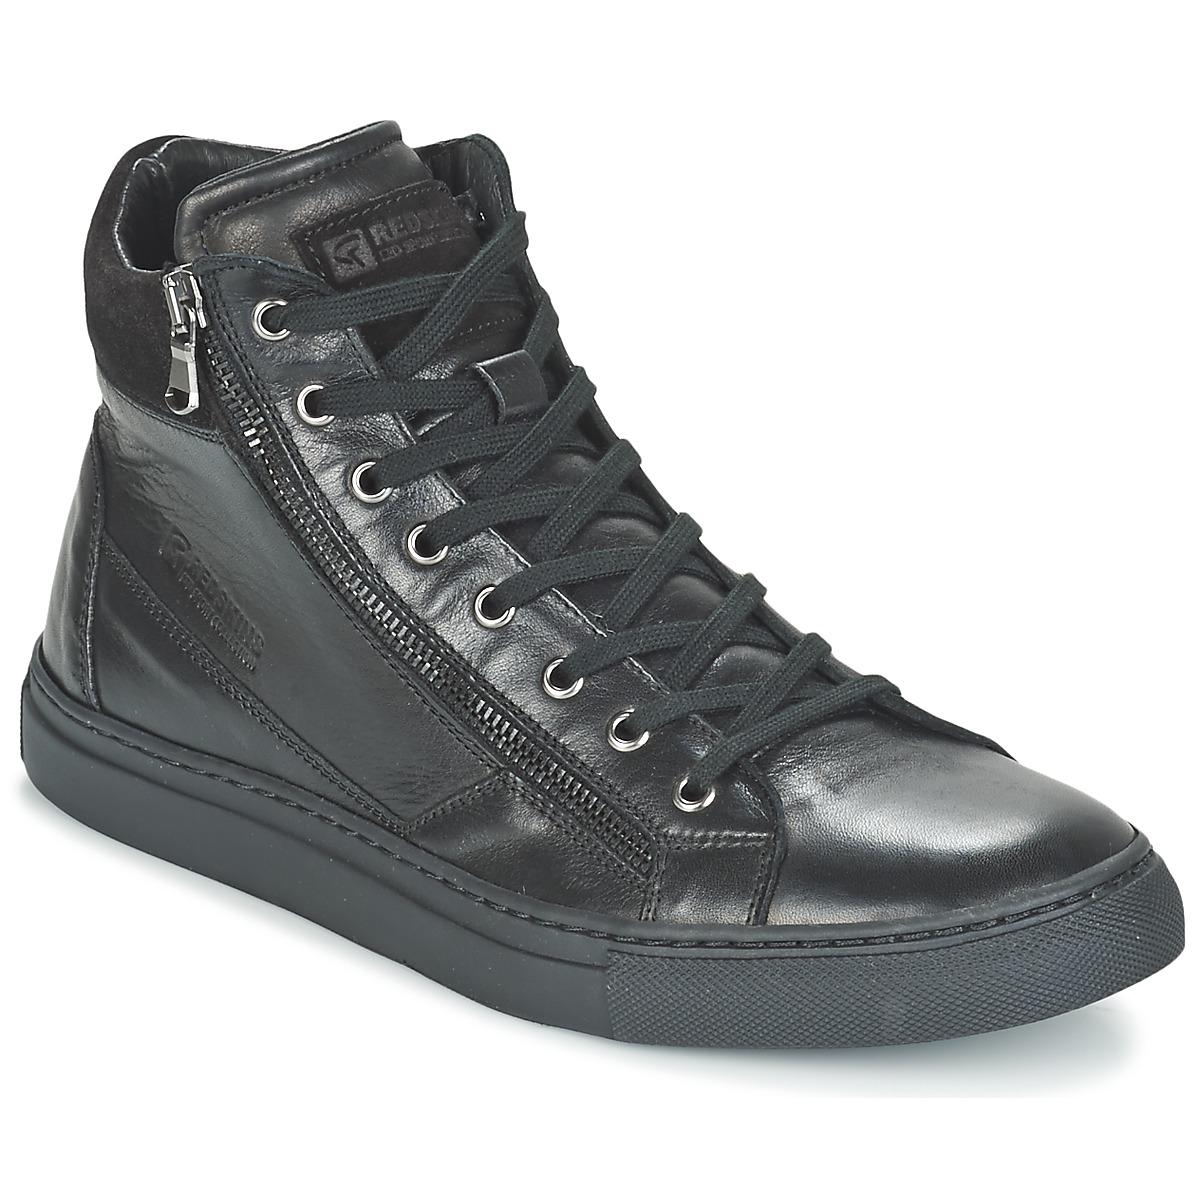 redskins nerino noir livraison gratuite avec chaussures basket montante homme. Black Bedroom Furniture Sets. Home Design Ideas